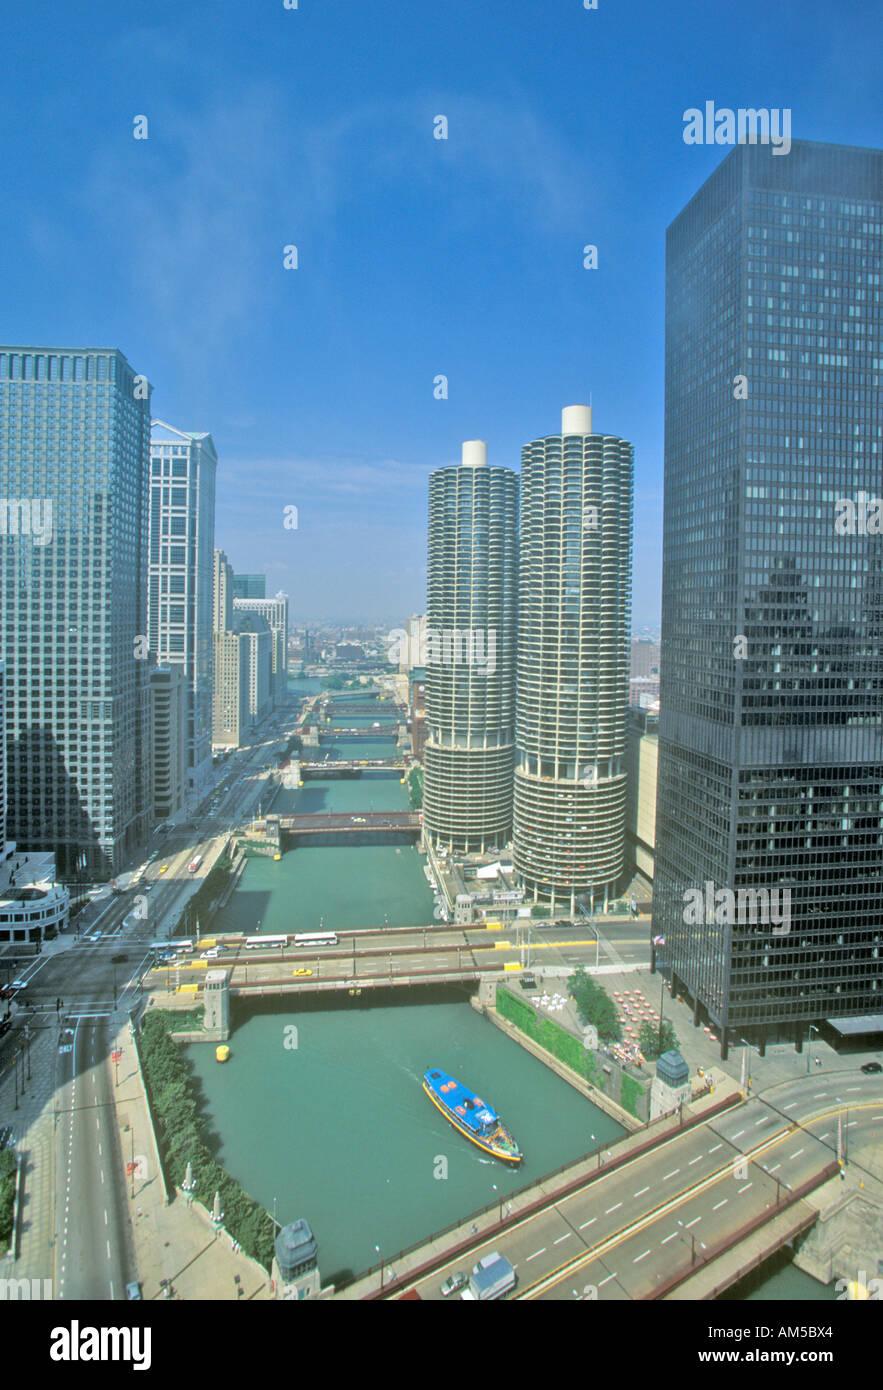 marina towers apartments chicago illinois stock photo 8659427 alamy